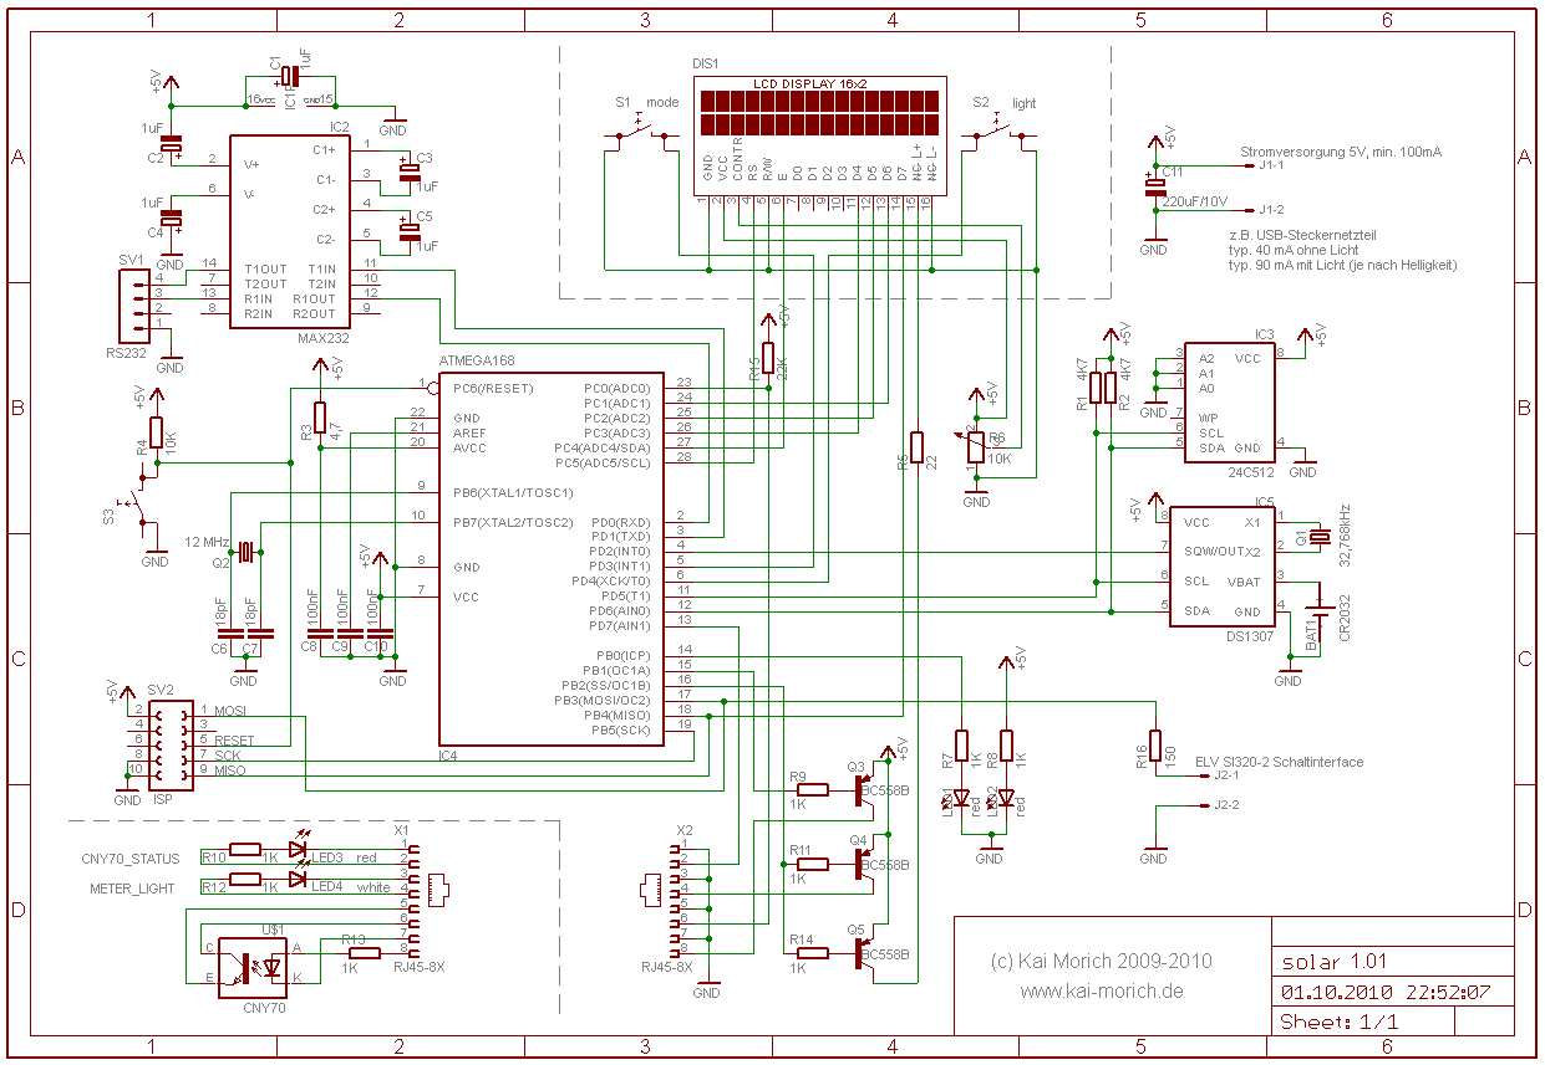 Fein Beleuchtung Wechselrichter Schaltplan Fotos - Der Schaltplan ...